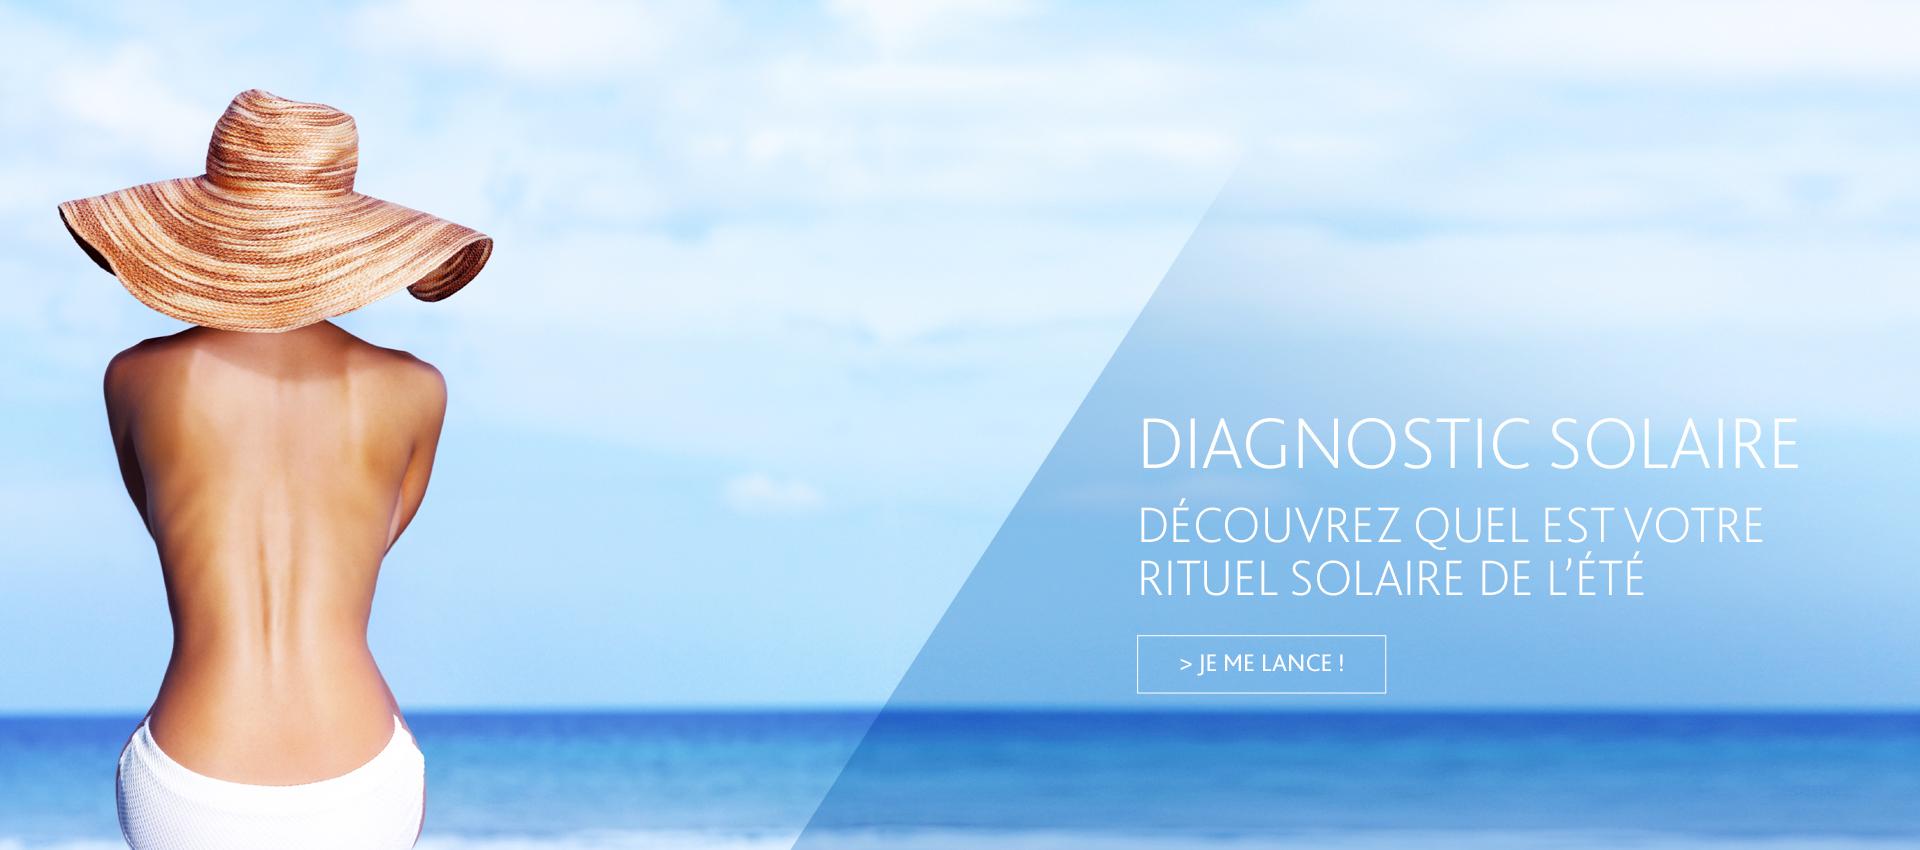 Diagnostic Solaire Institut Esthederm